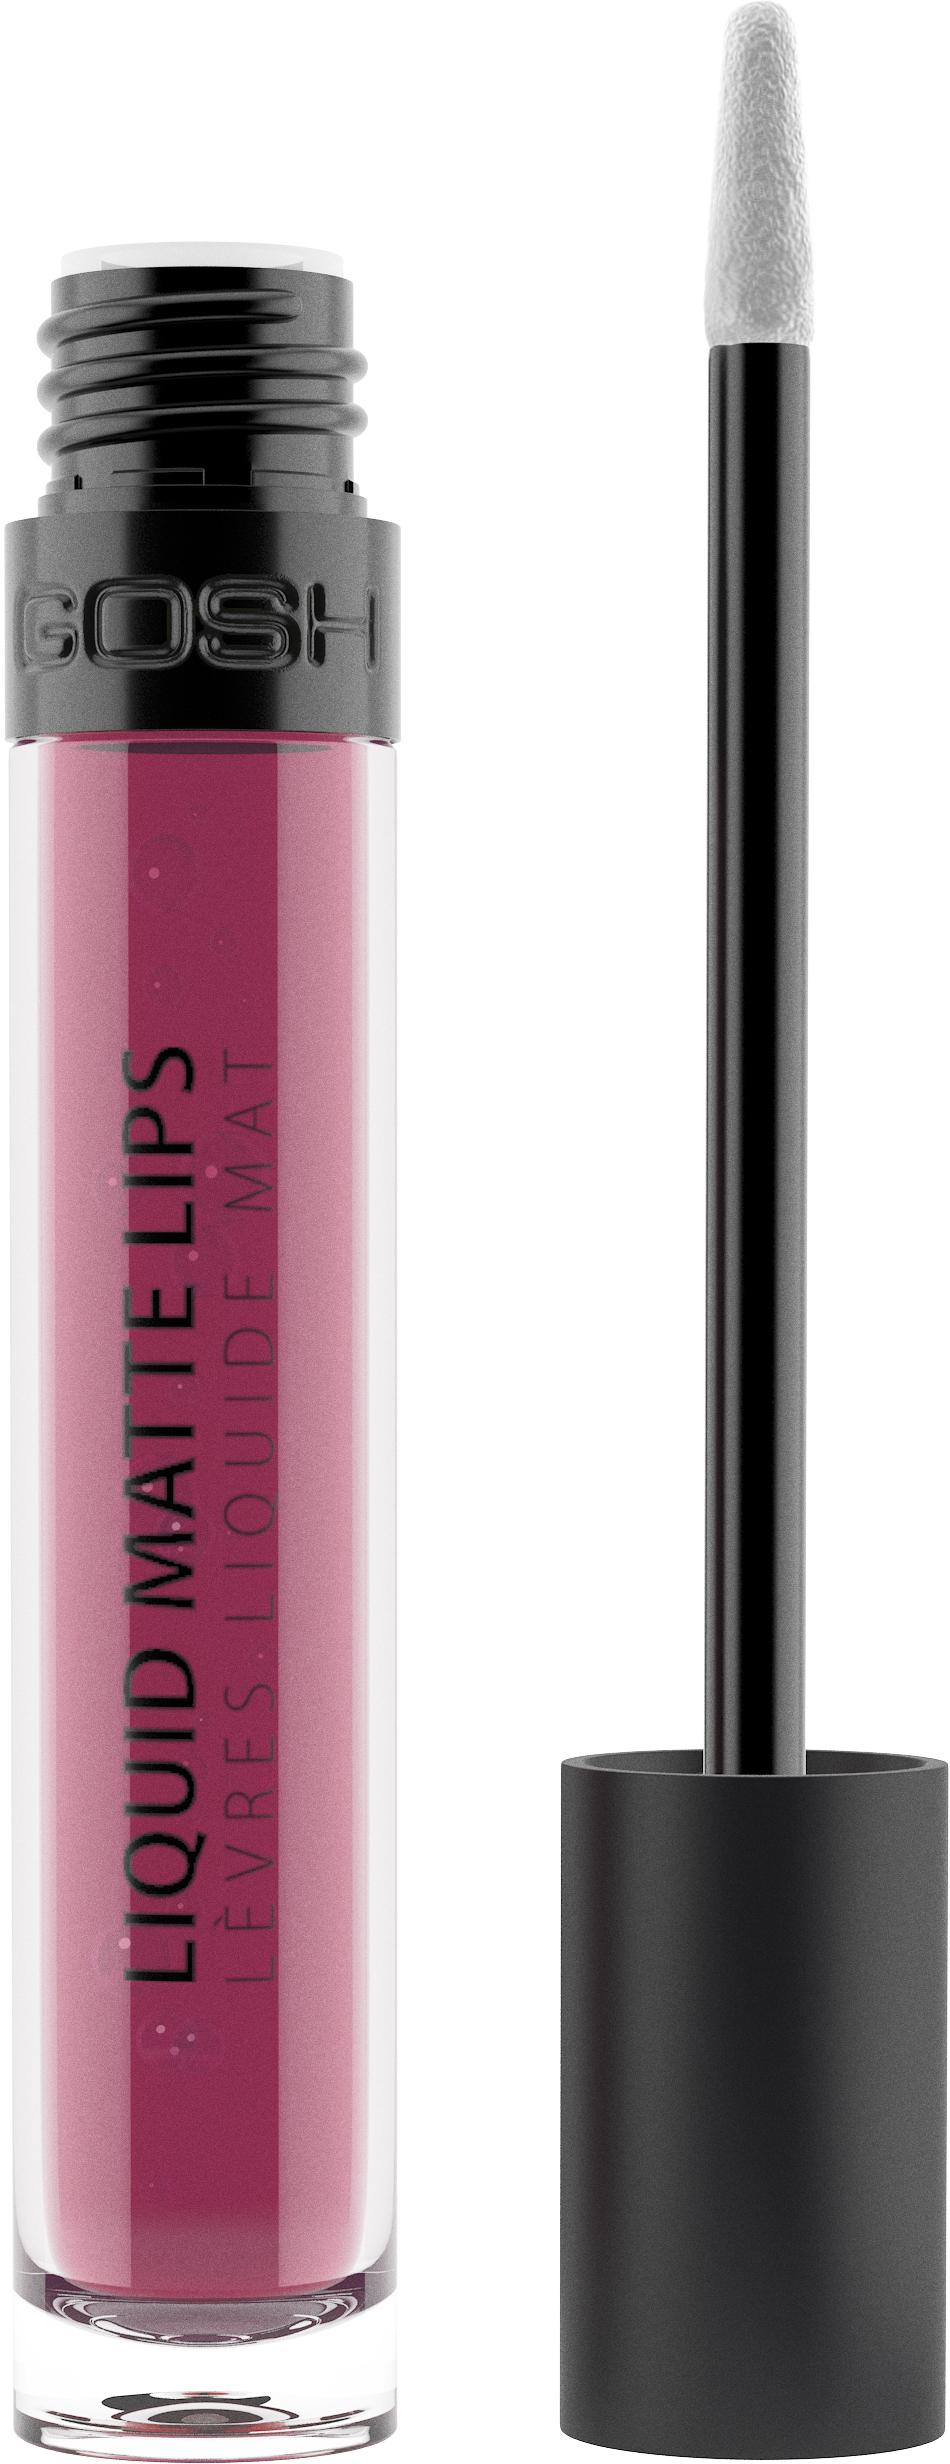 Liquid Matte Lips N06 open .jpg